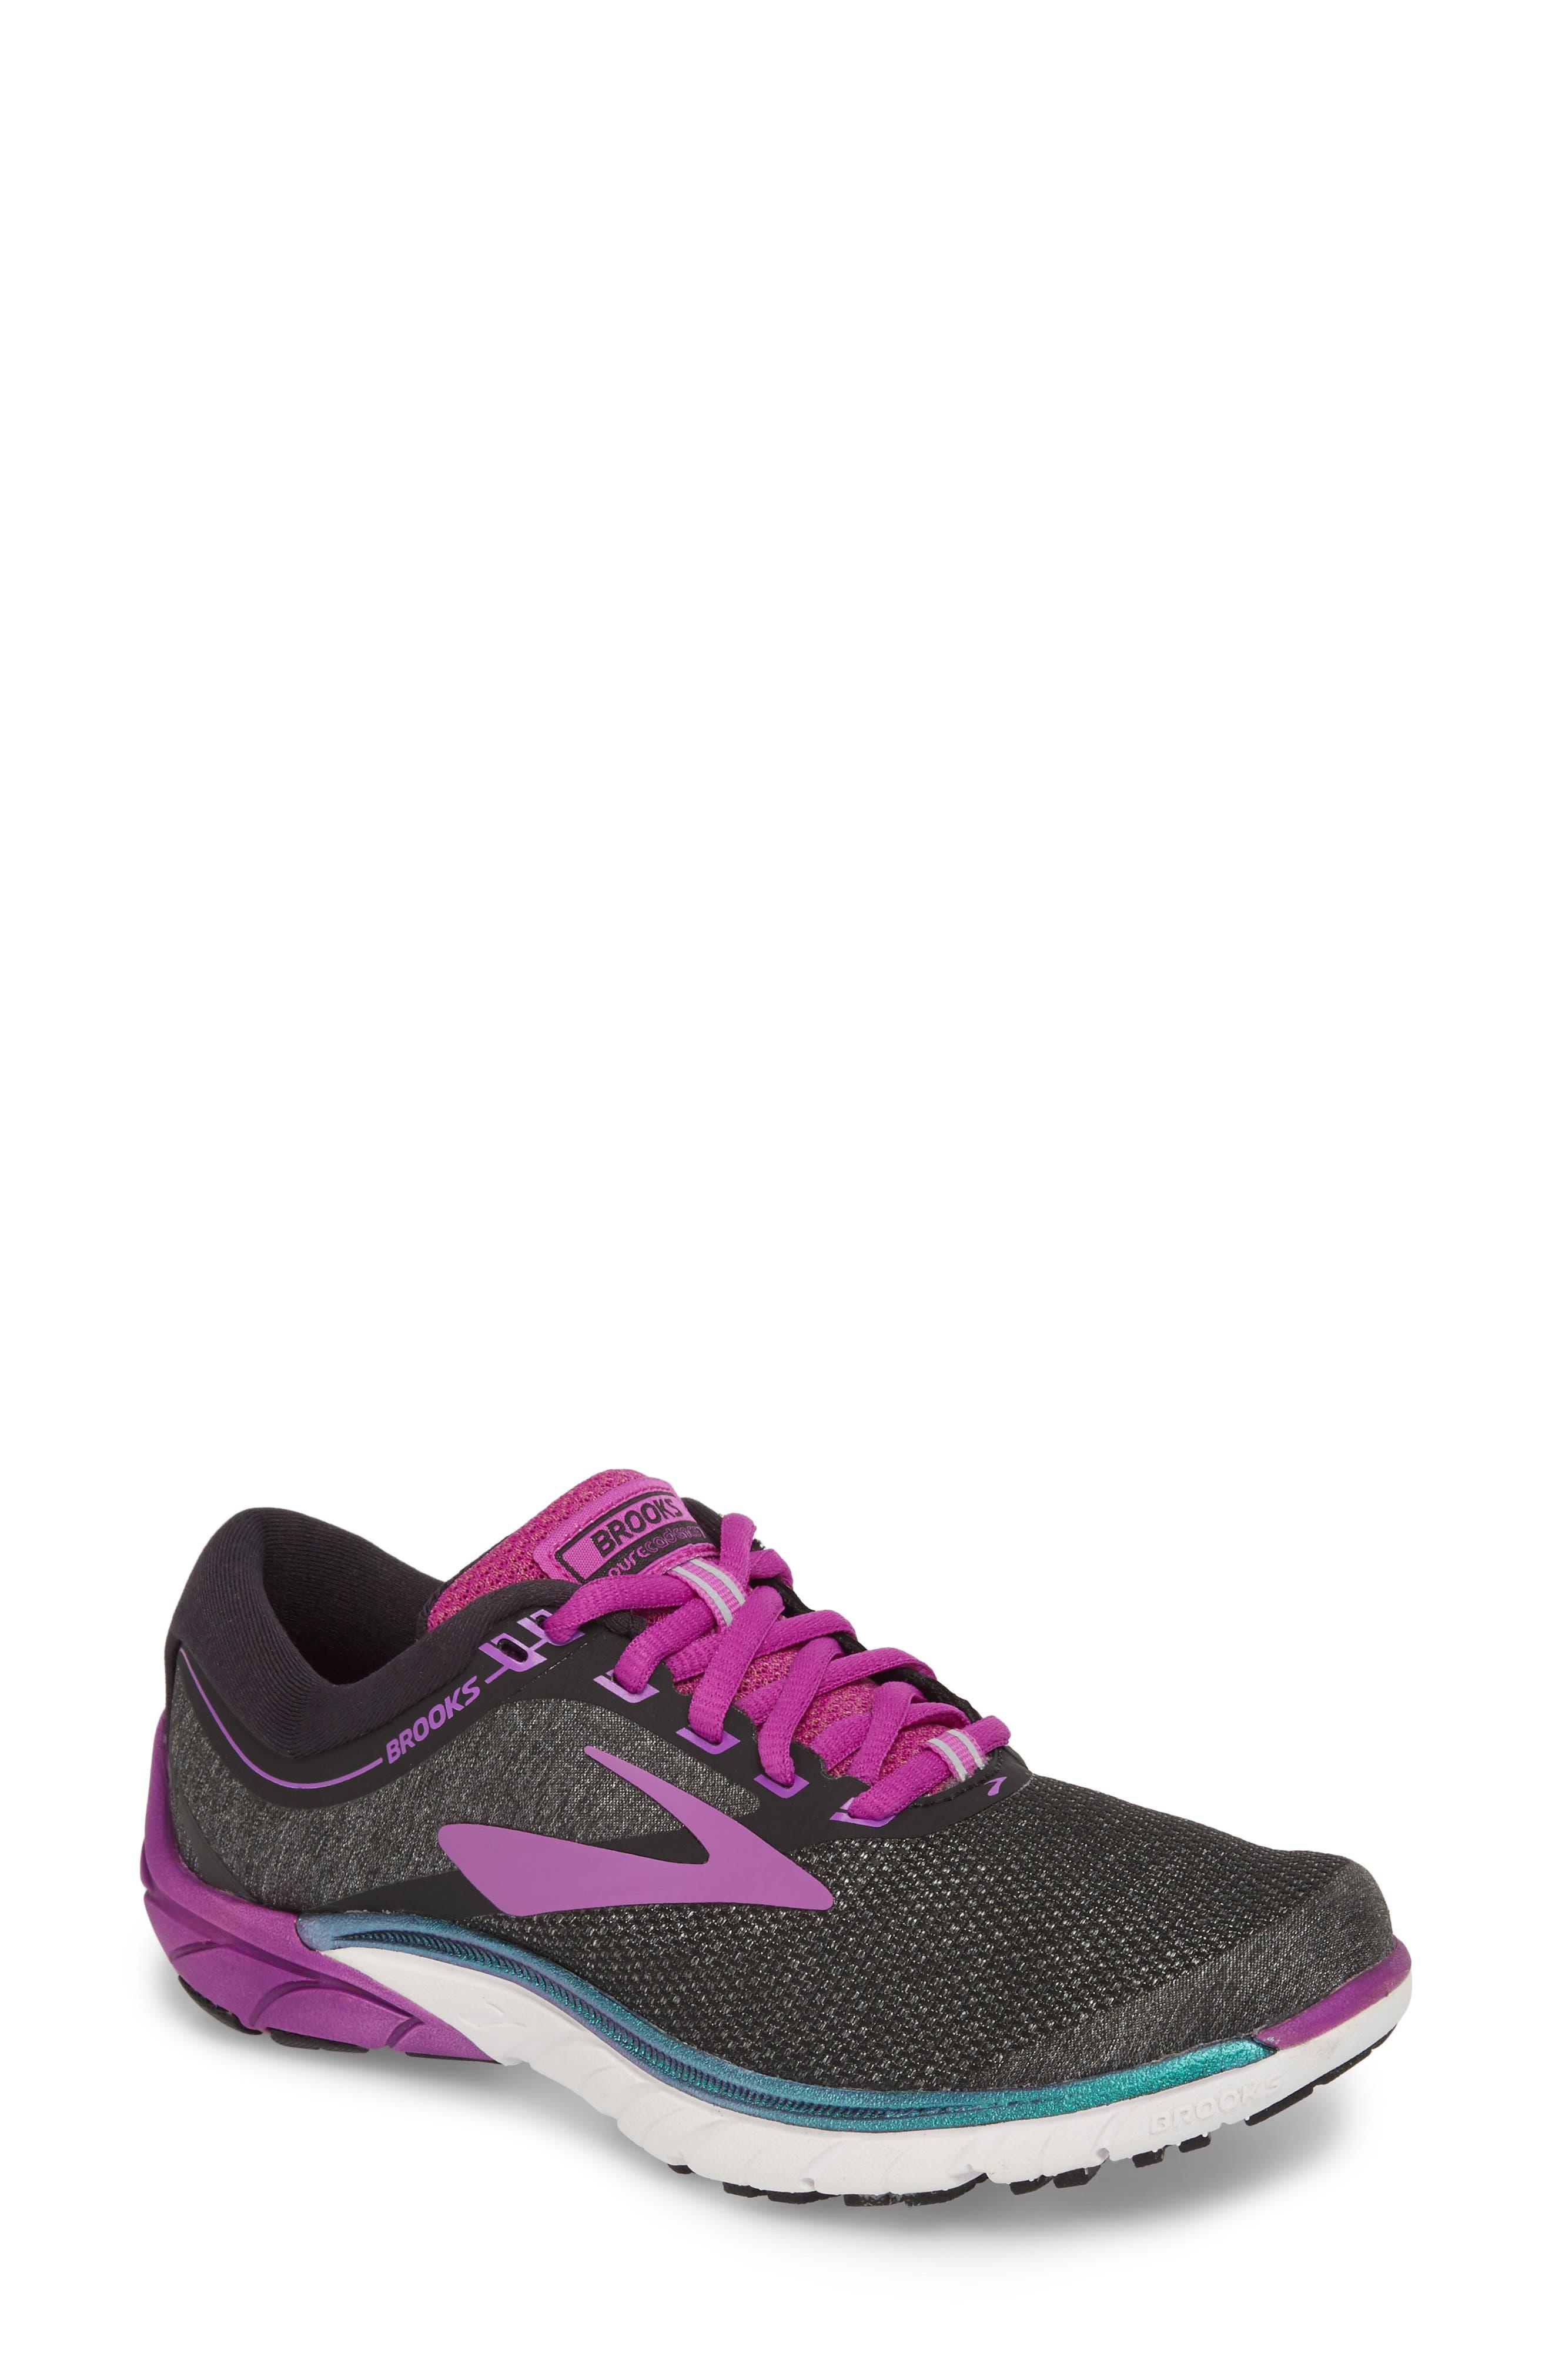 PureCadence 7 Road Running Shoe, Main, color, BLACK/ PURPLE/ MULTI